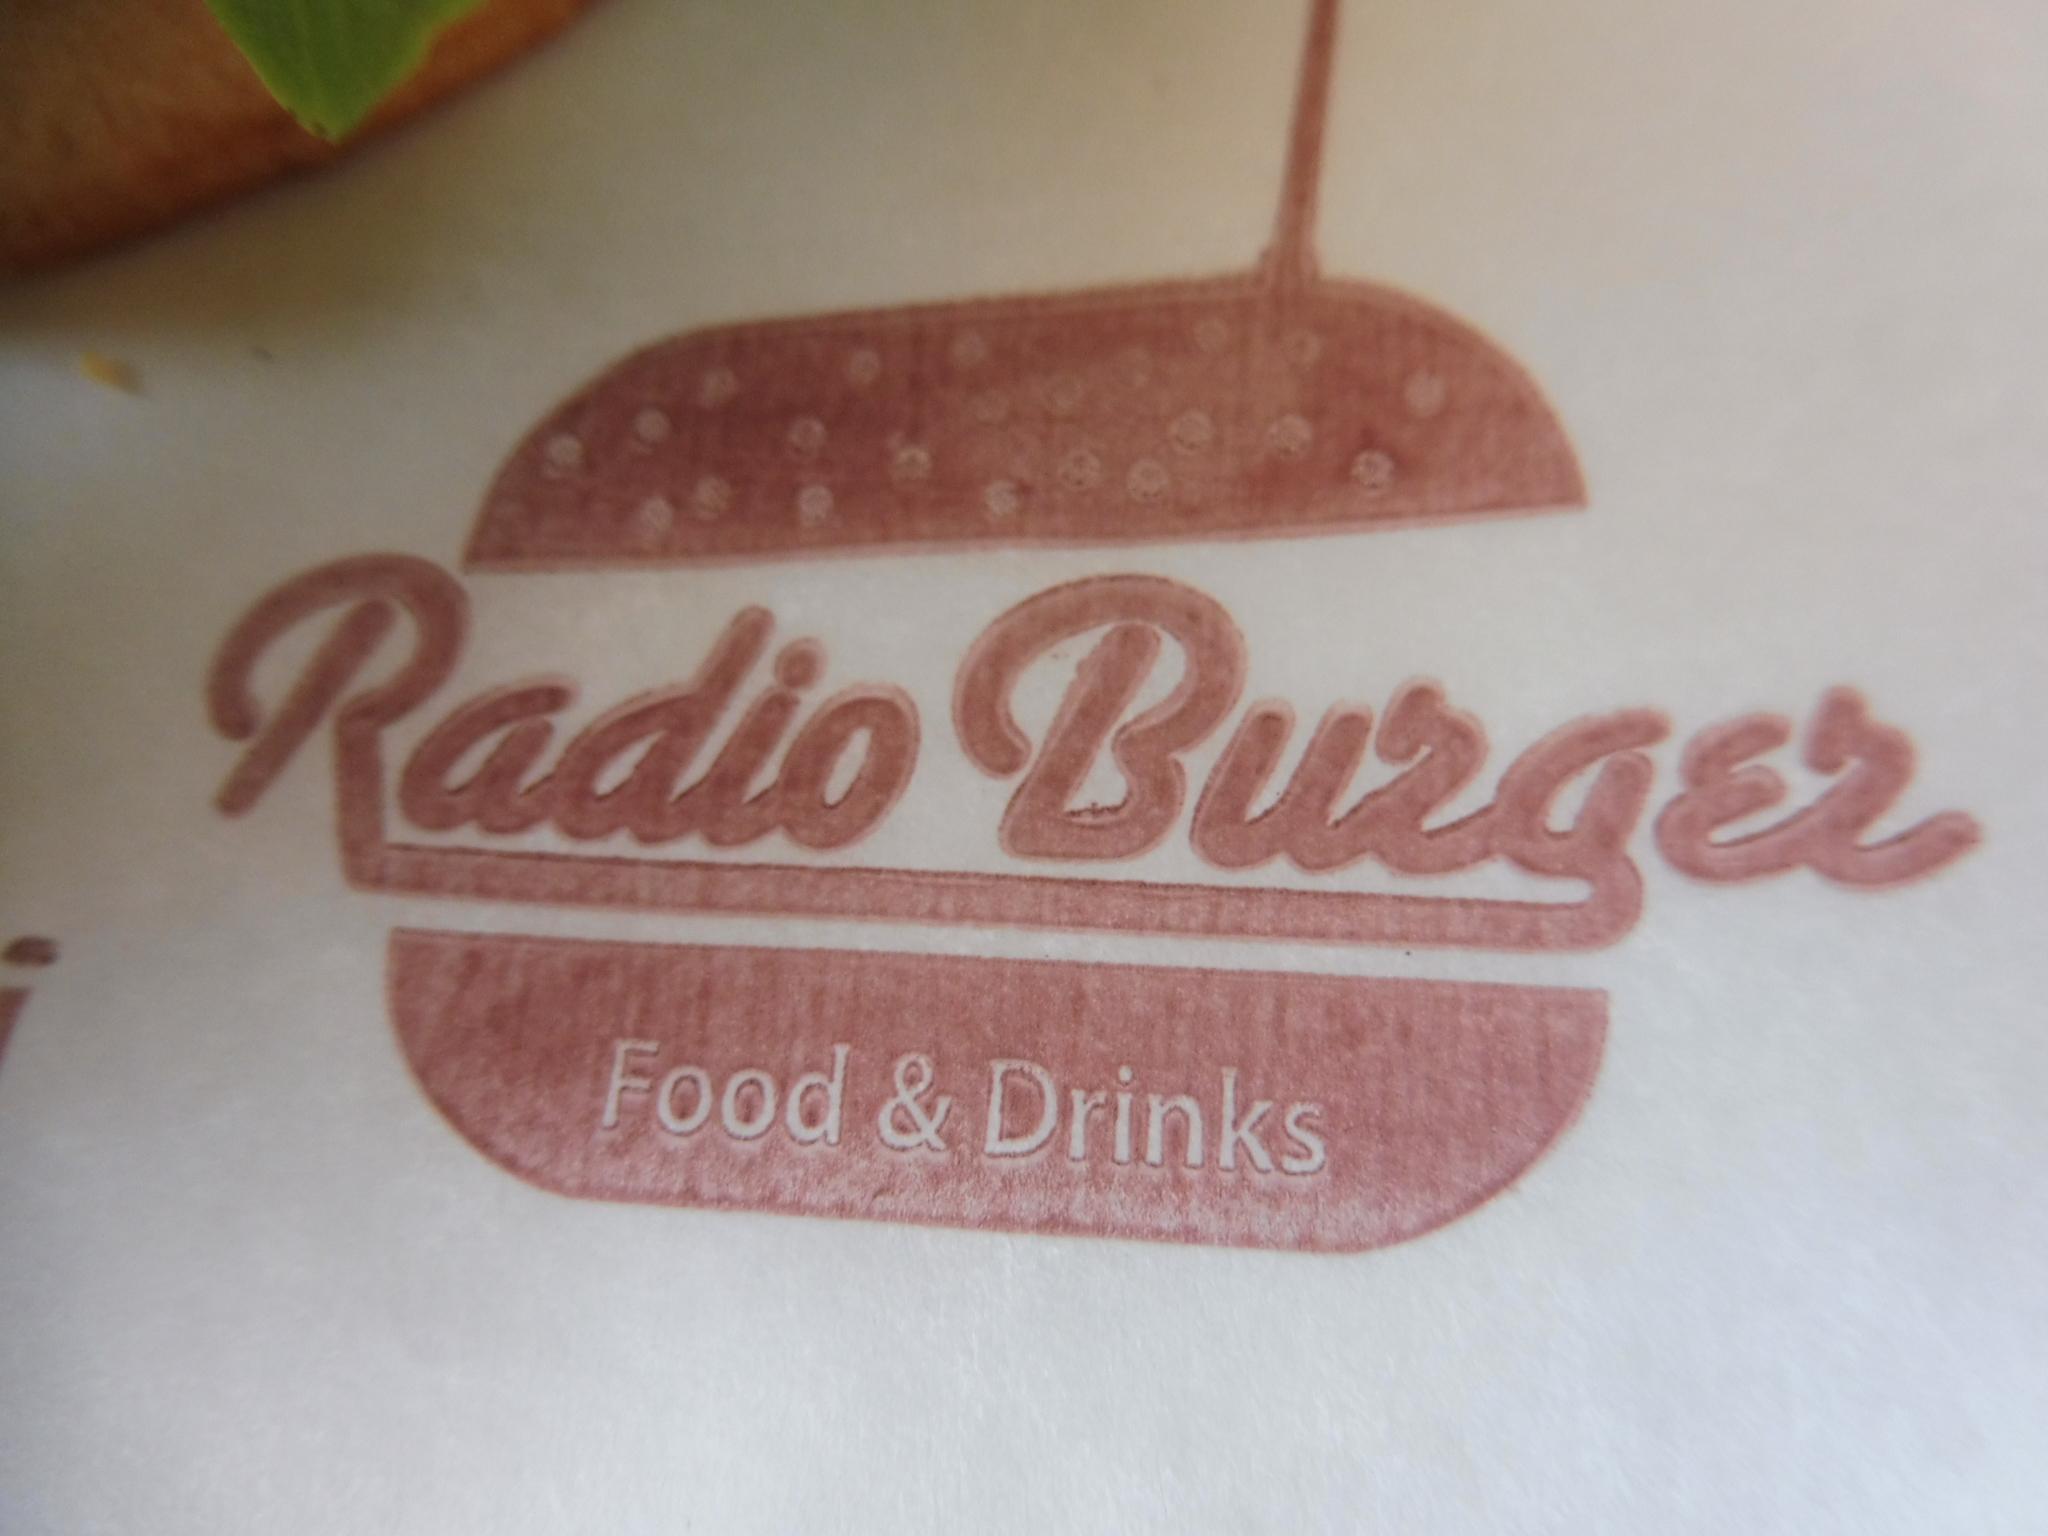 RADIO BURGER POUR MANGER PAS CHER A SANTA MARTA